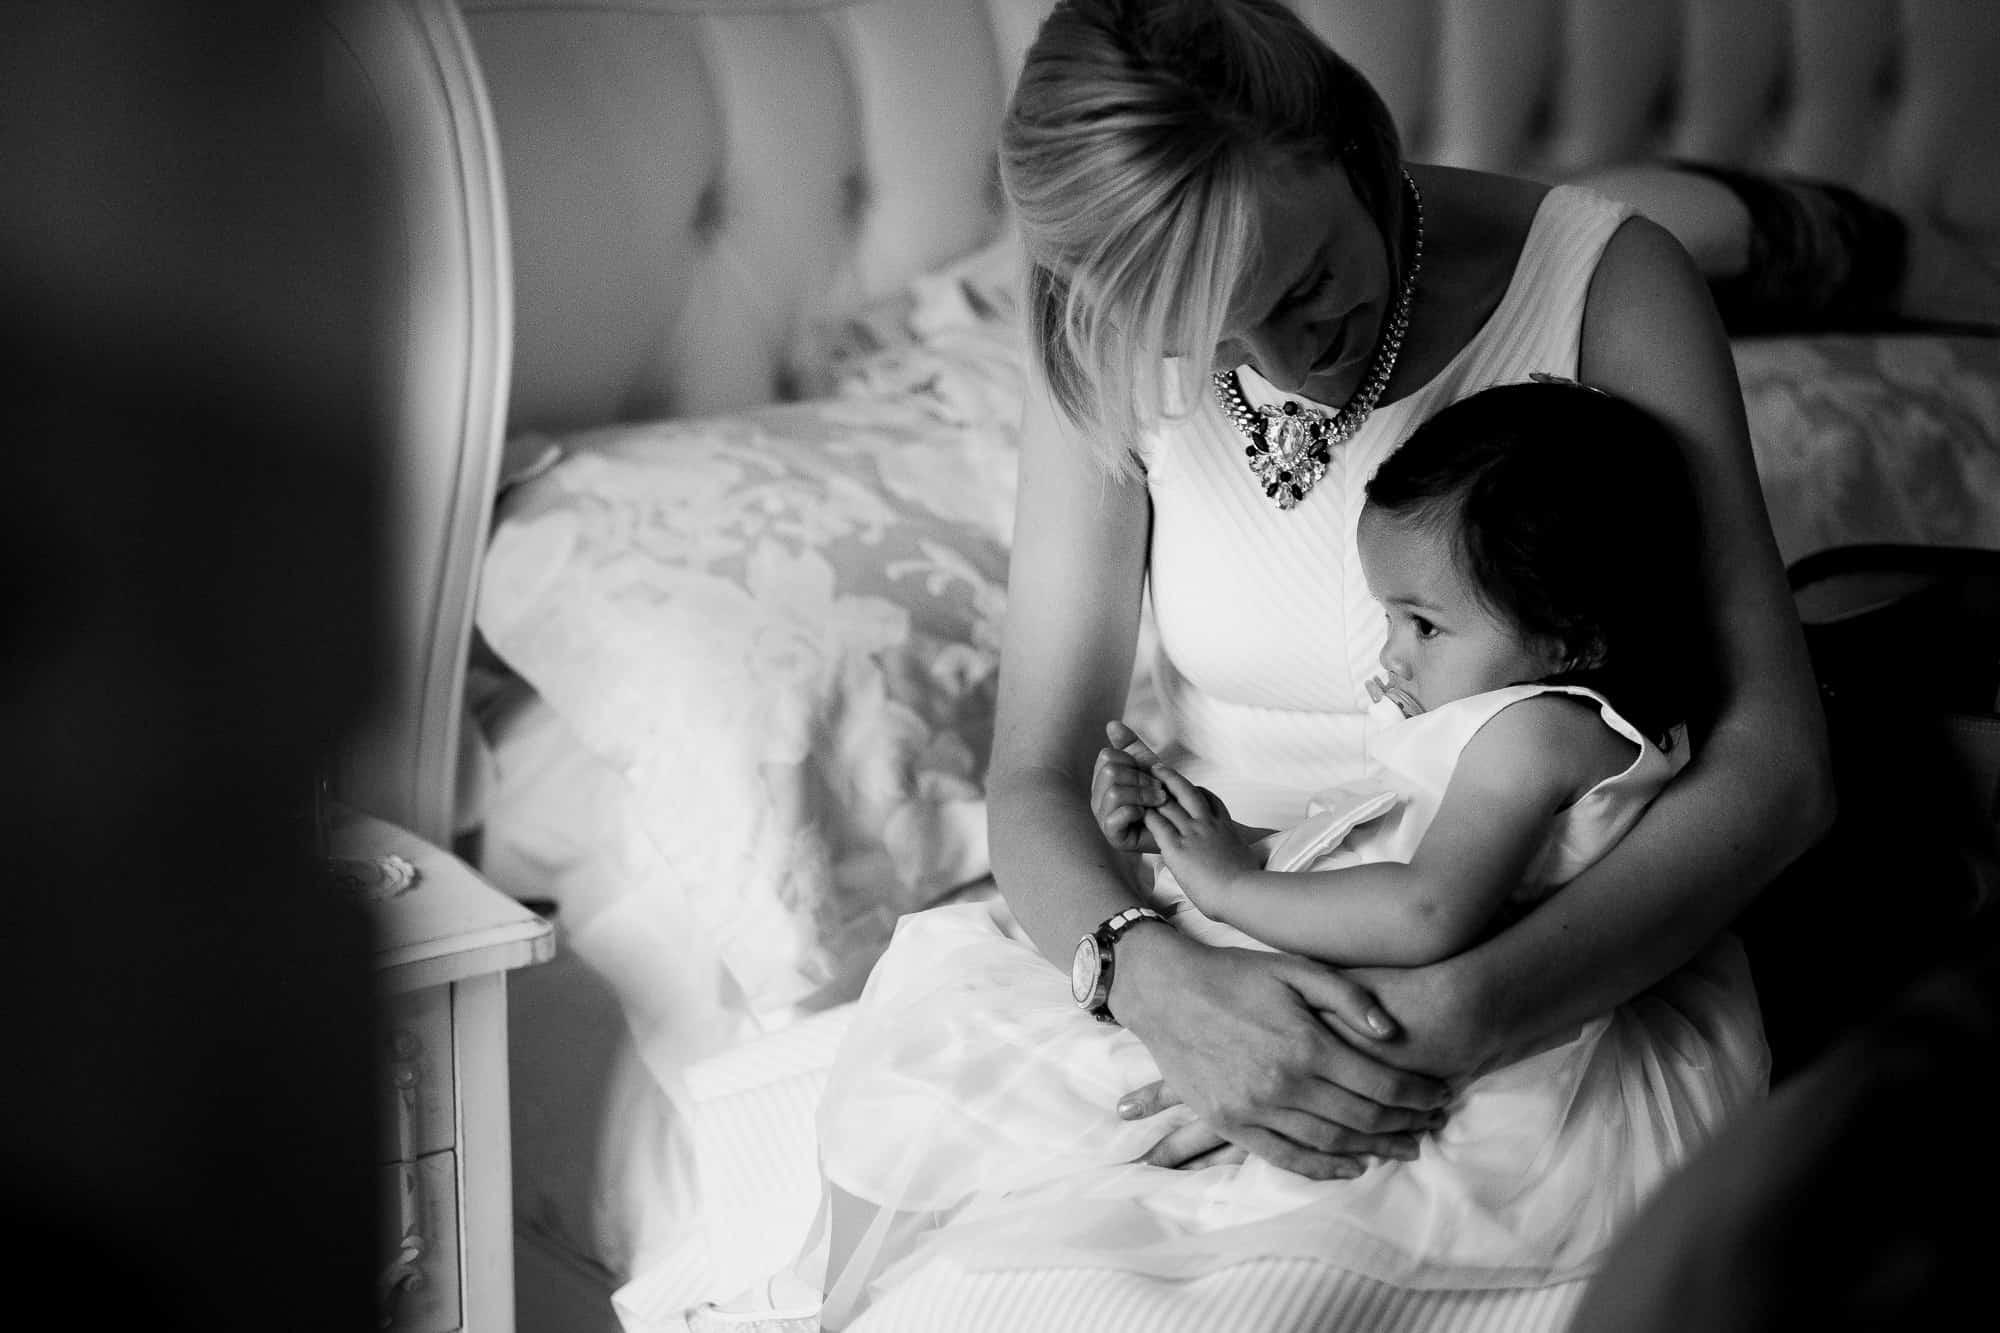 marleybrook-house-wedding-photography-matt-tyler-0019